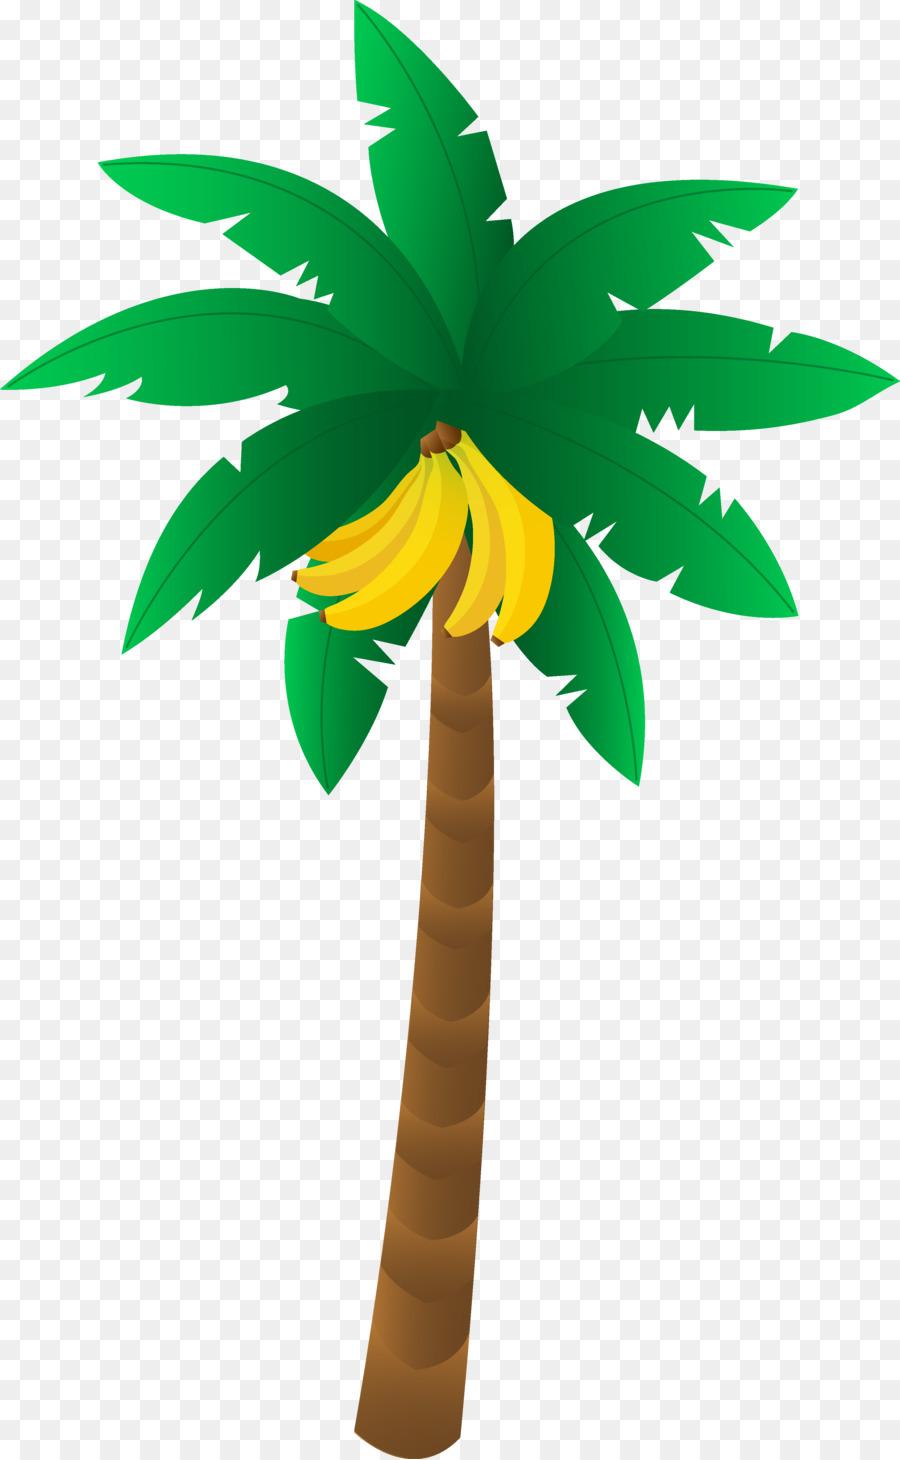 900x1460 Banana Leaf Clip Art